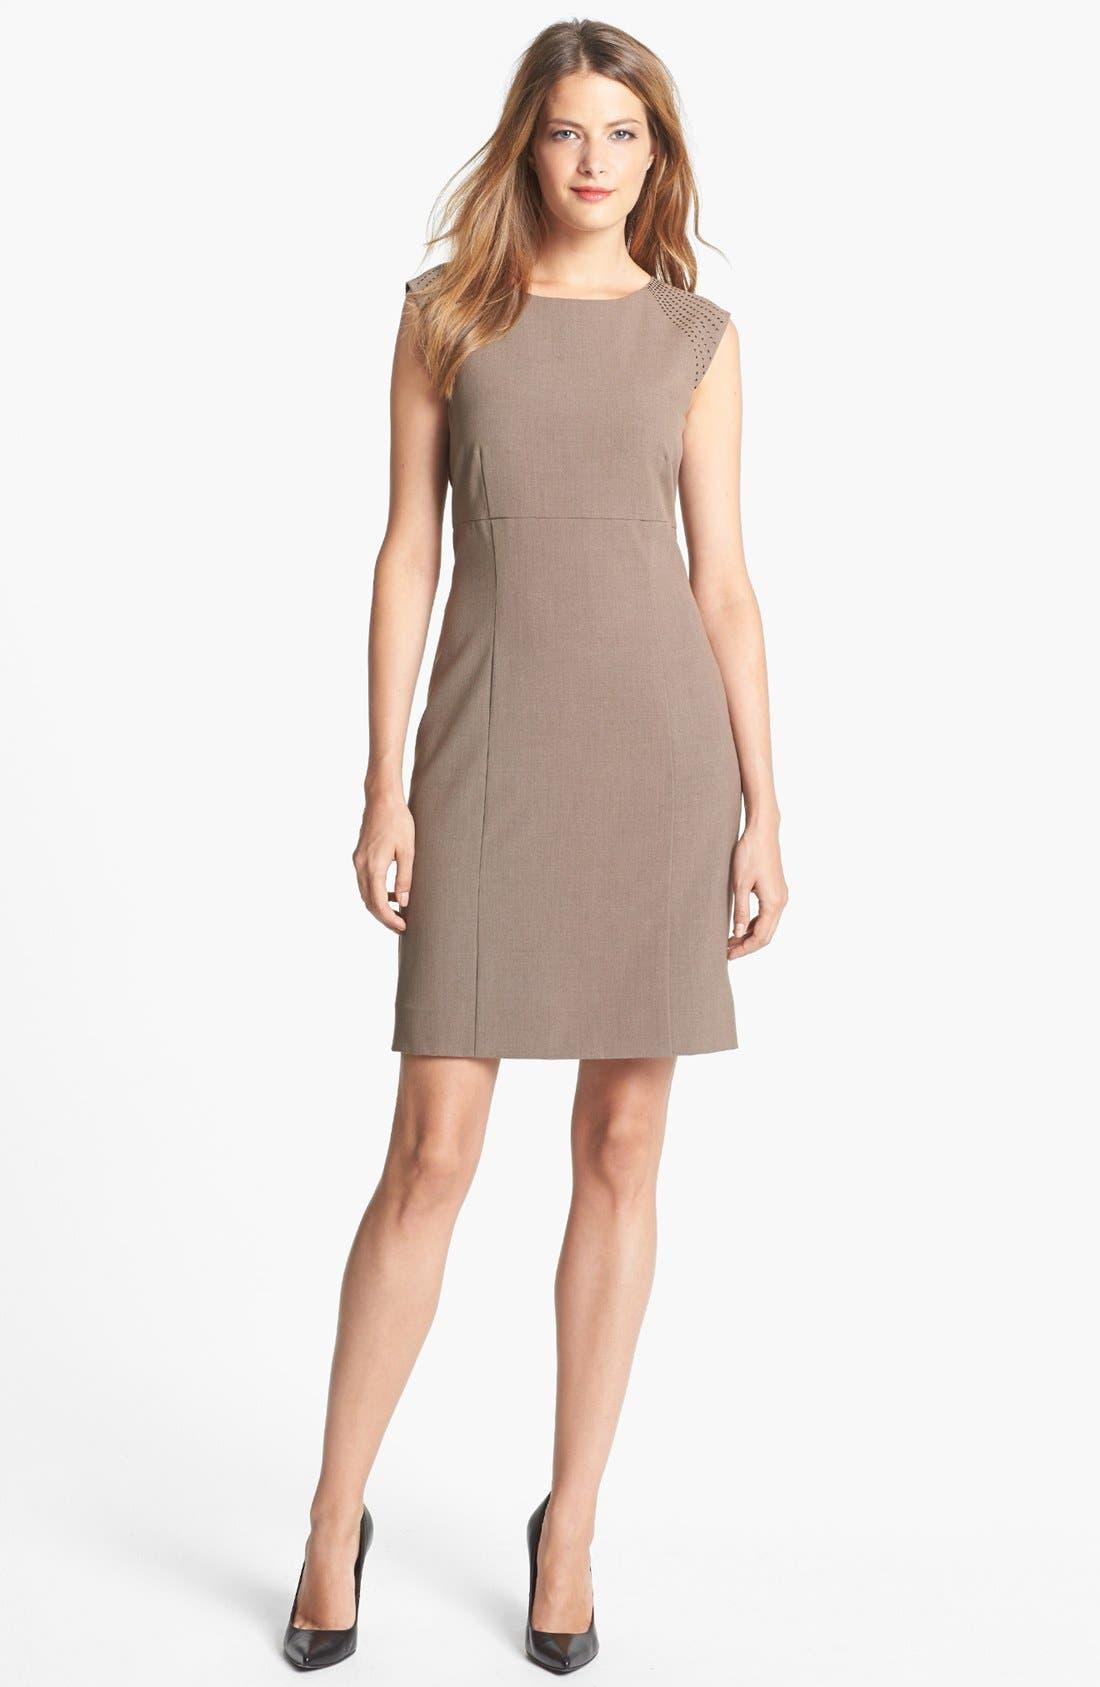 Alternate Image 1 Selected - Tahari Studded Shoulder Two-Way Stretch Sheath Dress